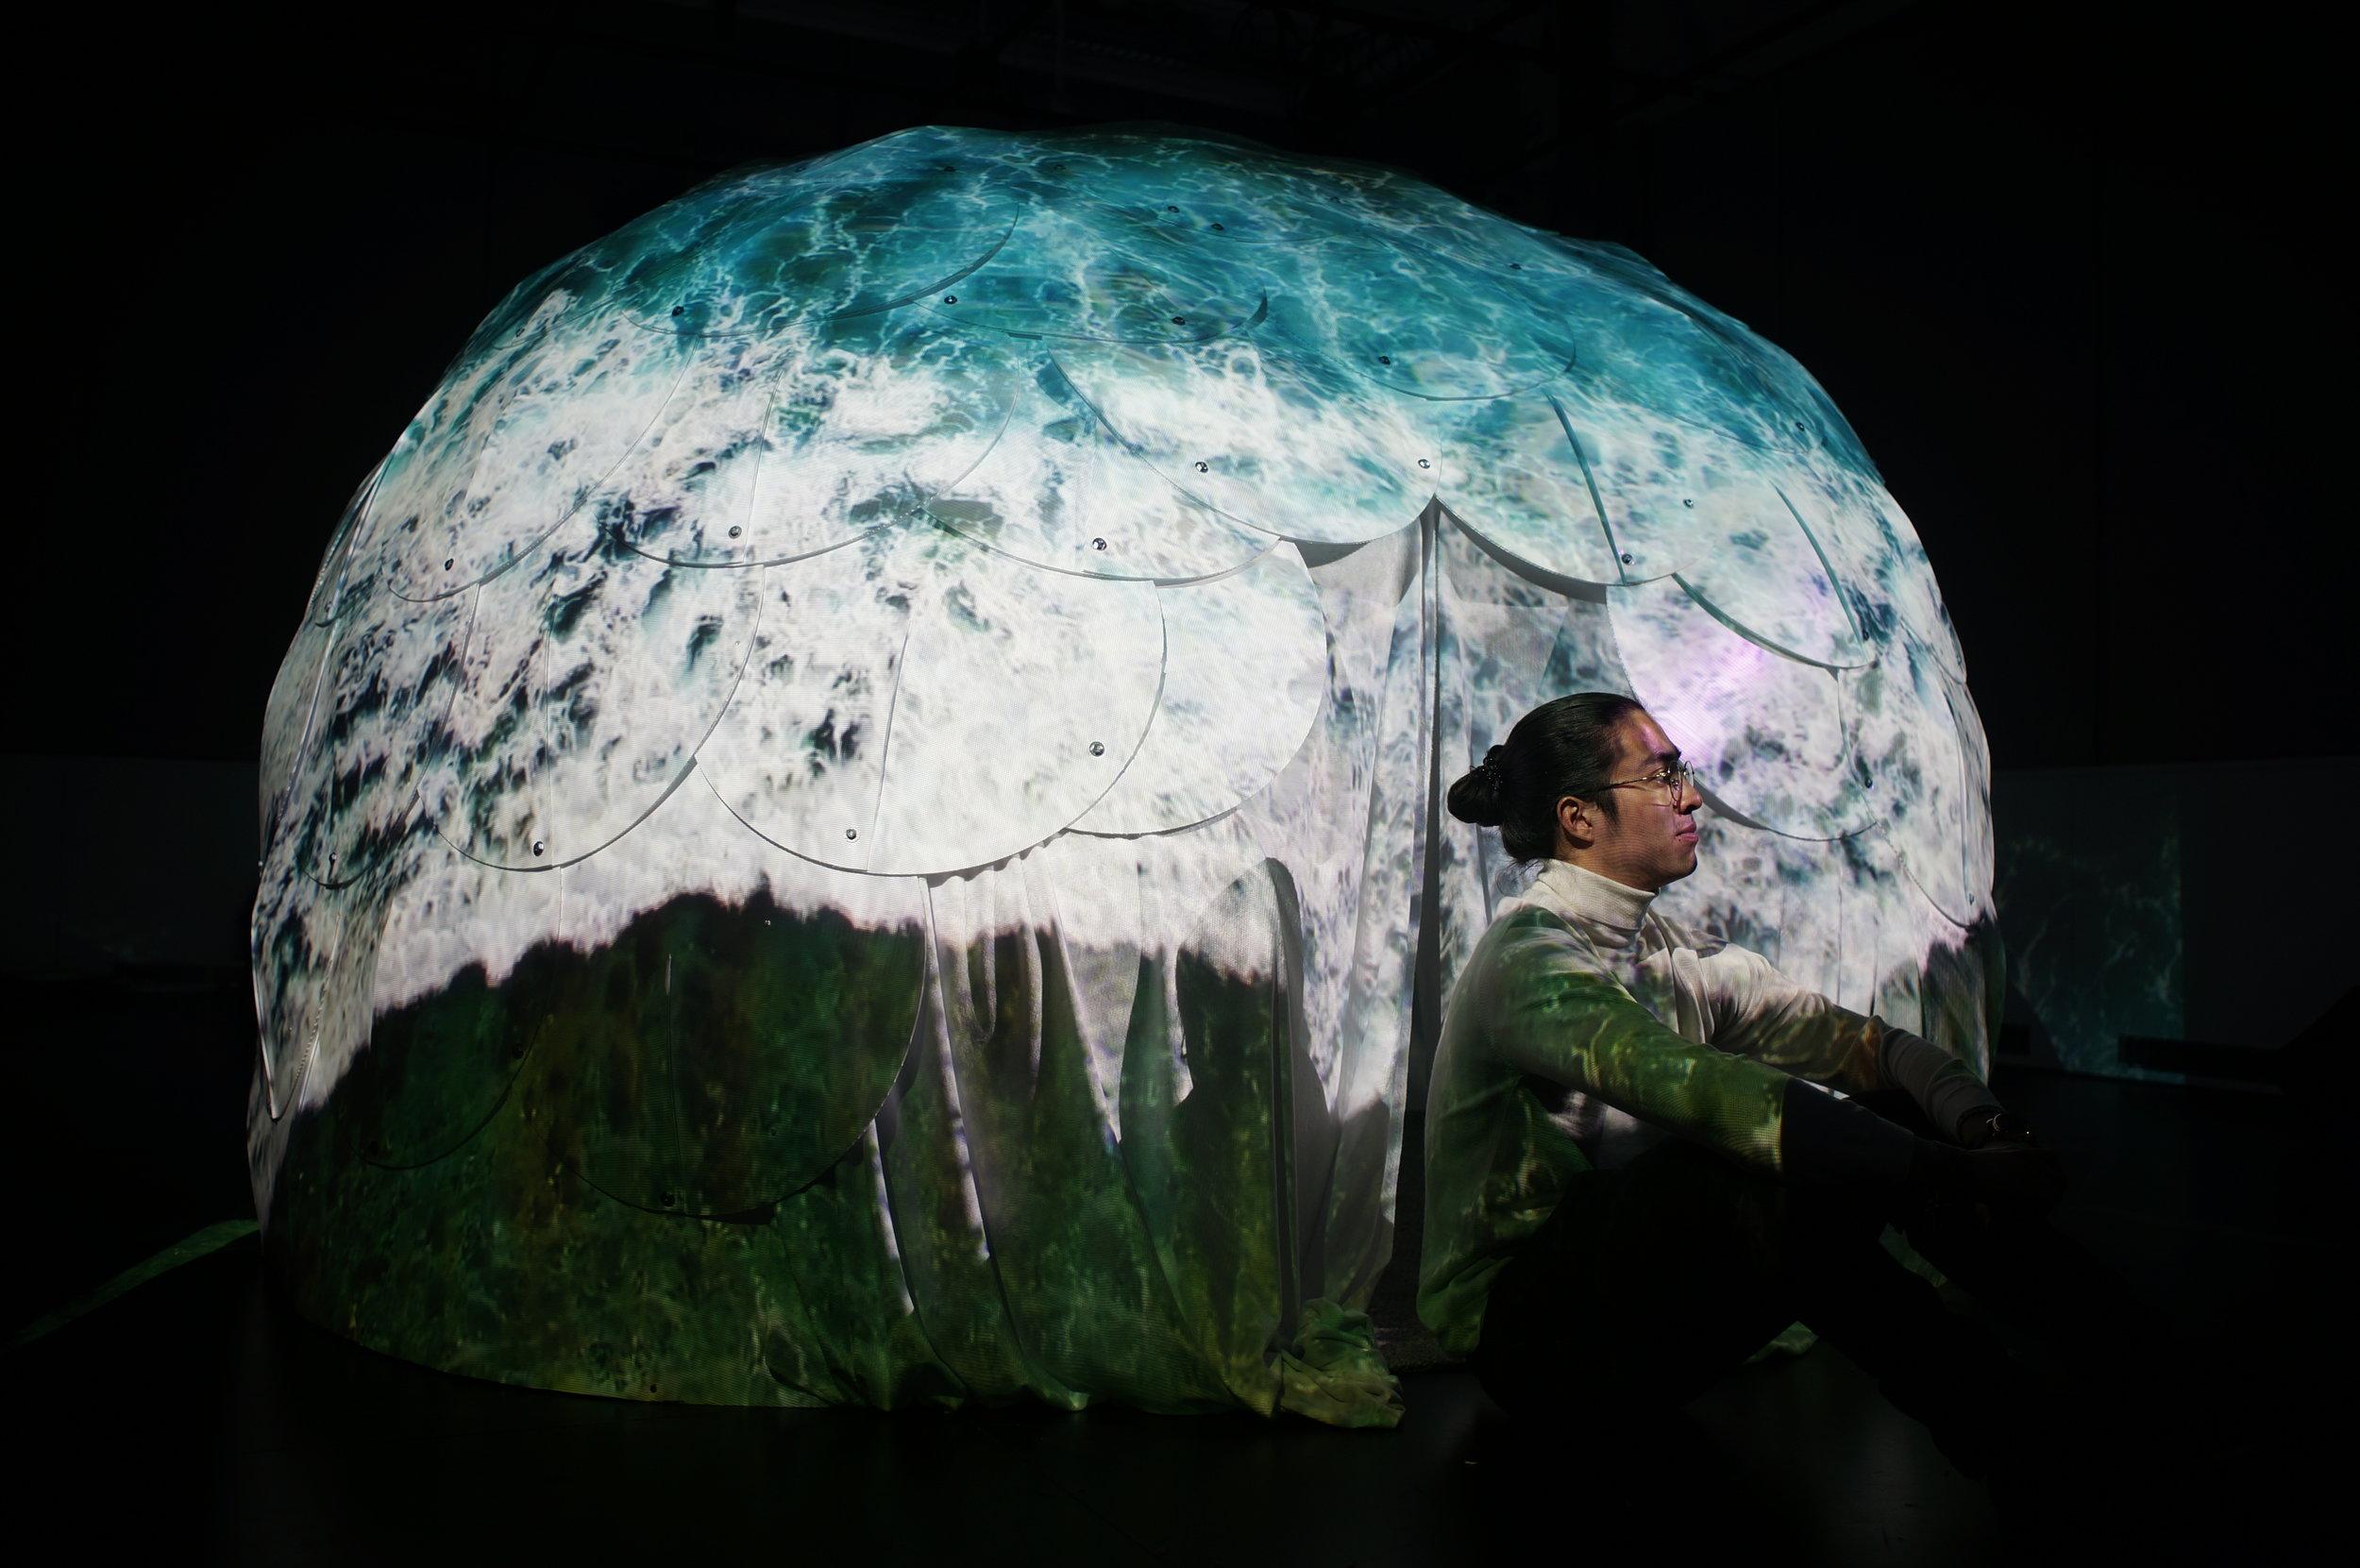 Ocean Room  Immersive installation and sculpture-space Duke University Rubenstein Arts Center, February 1-24